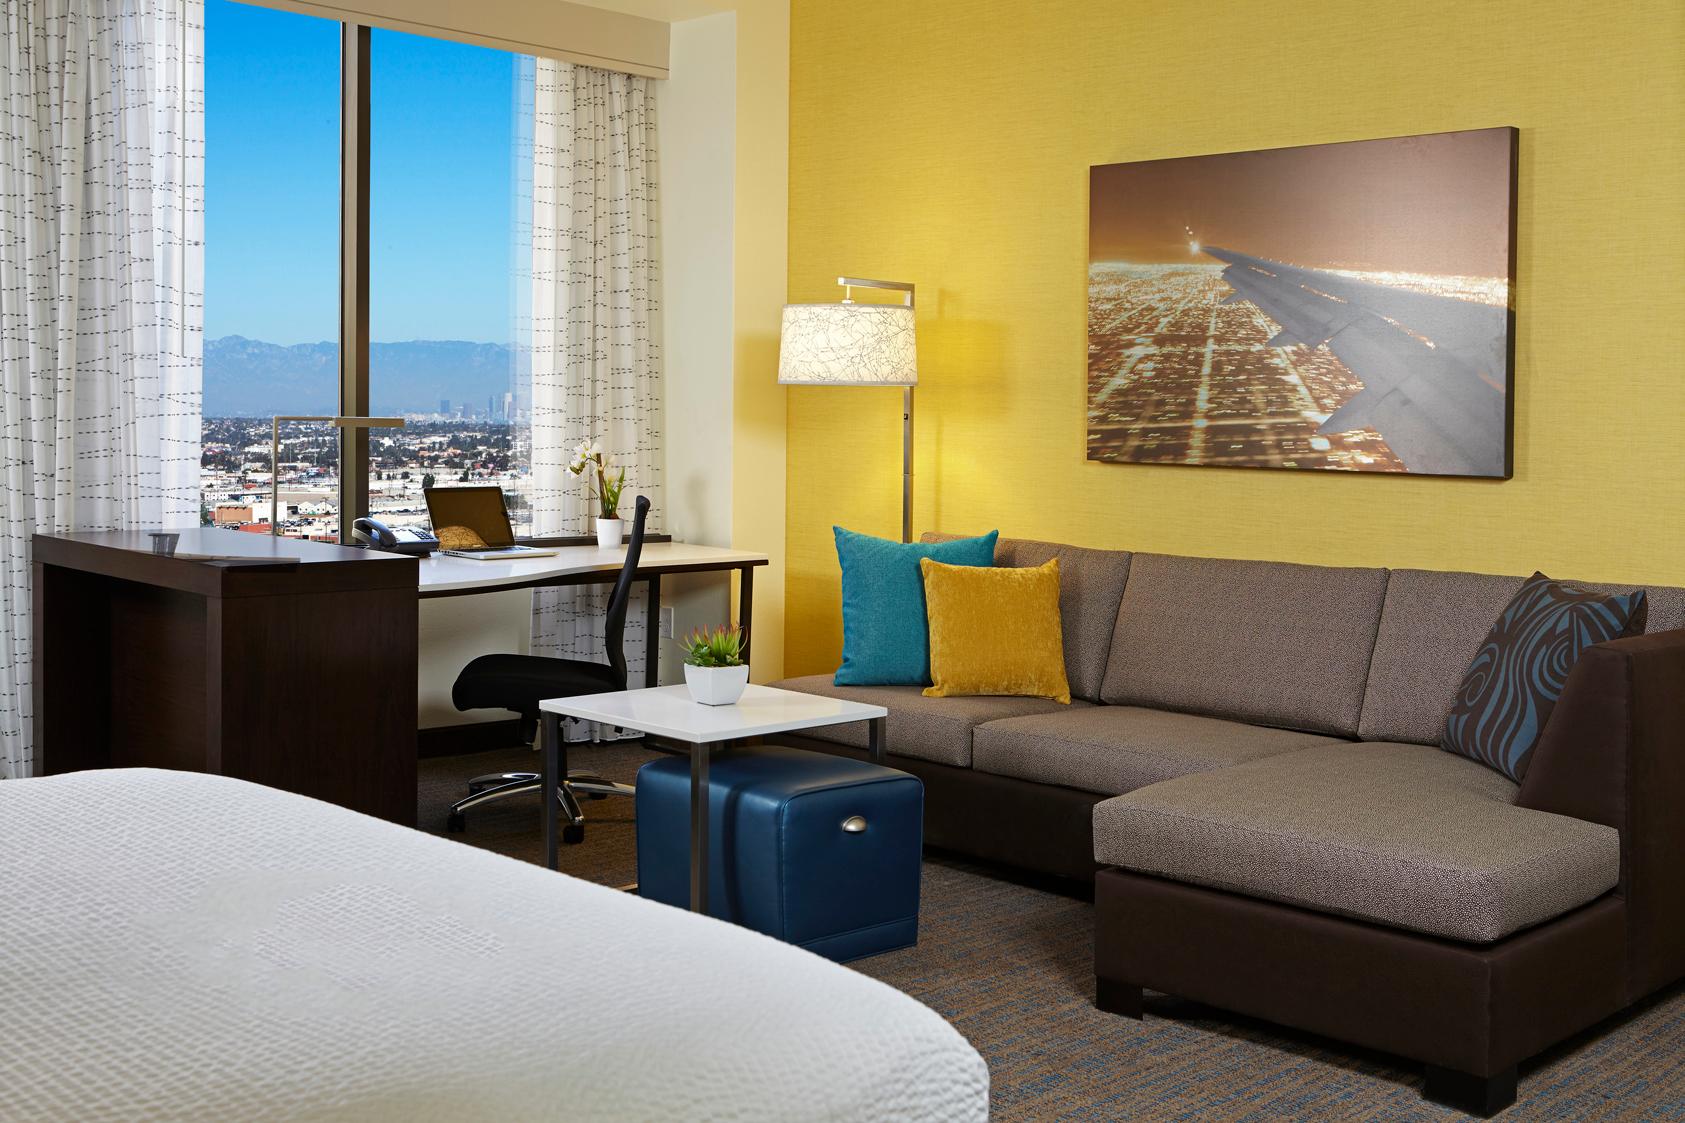 Residence Inn by Marriott Los Angeles LAX/Century Boulevard image 14